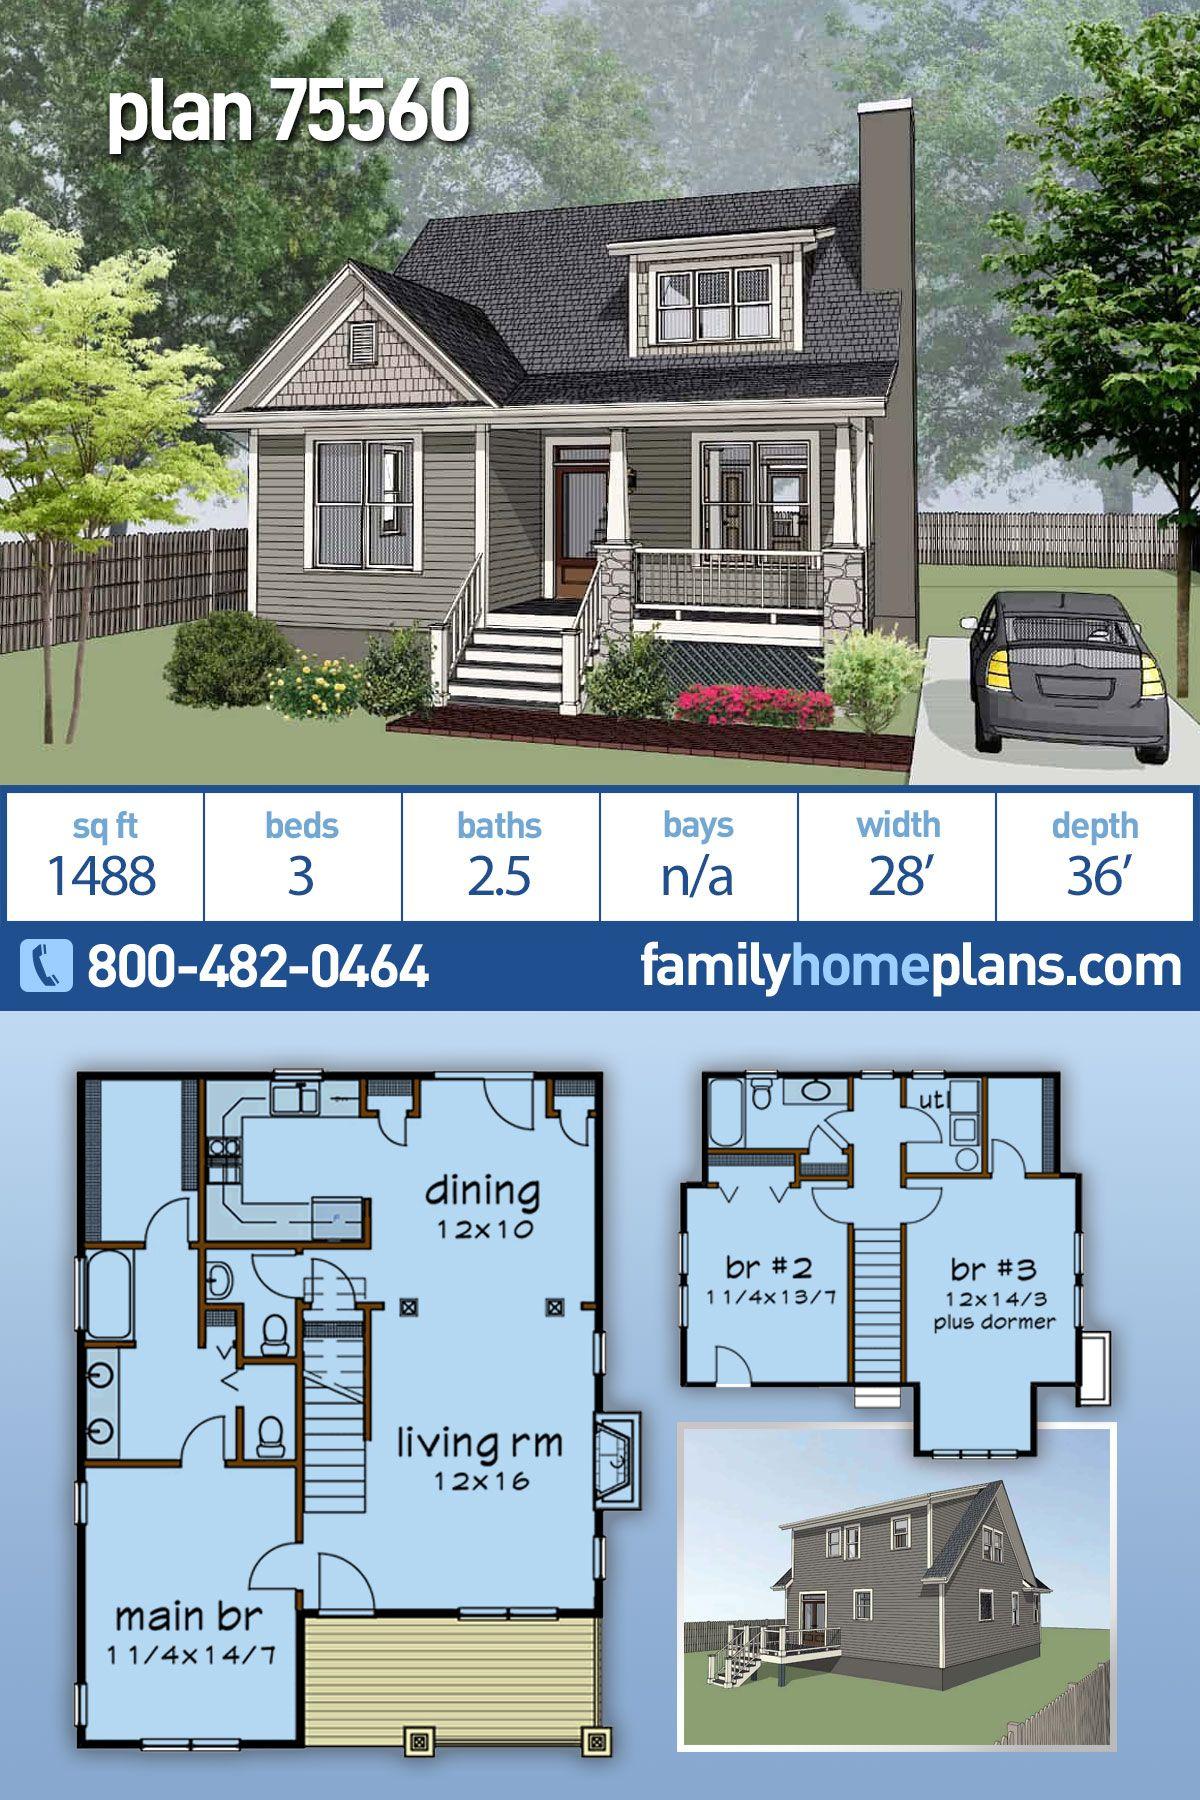 Photo of Craftsman Style Neighborhood House Plan #75560 | 3 Beds, 2.5 Baths 1488 Sq ft Home Plan